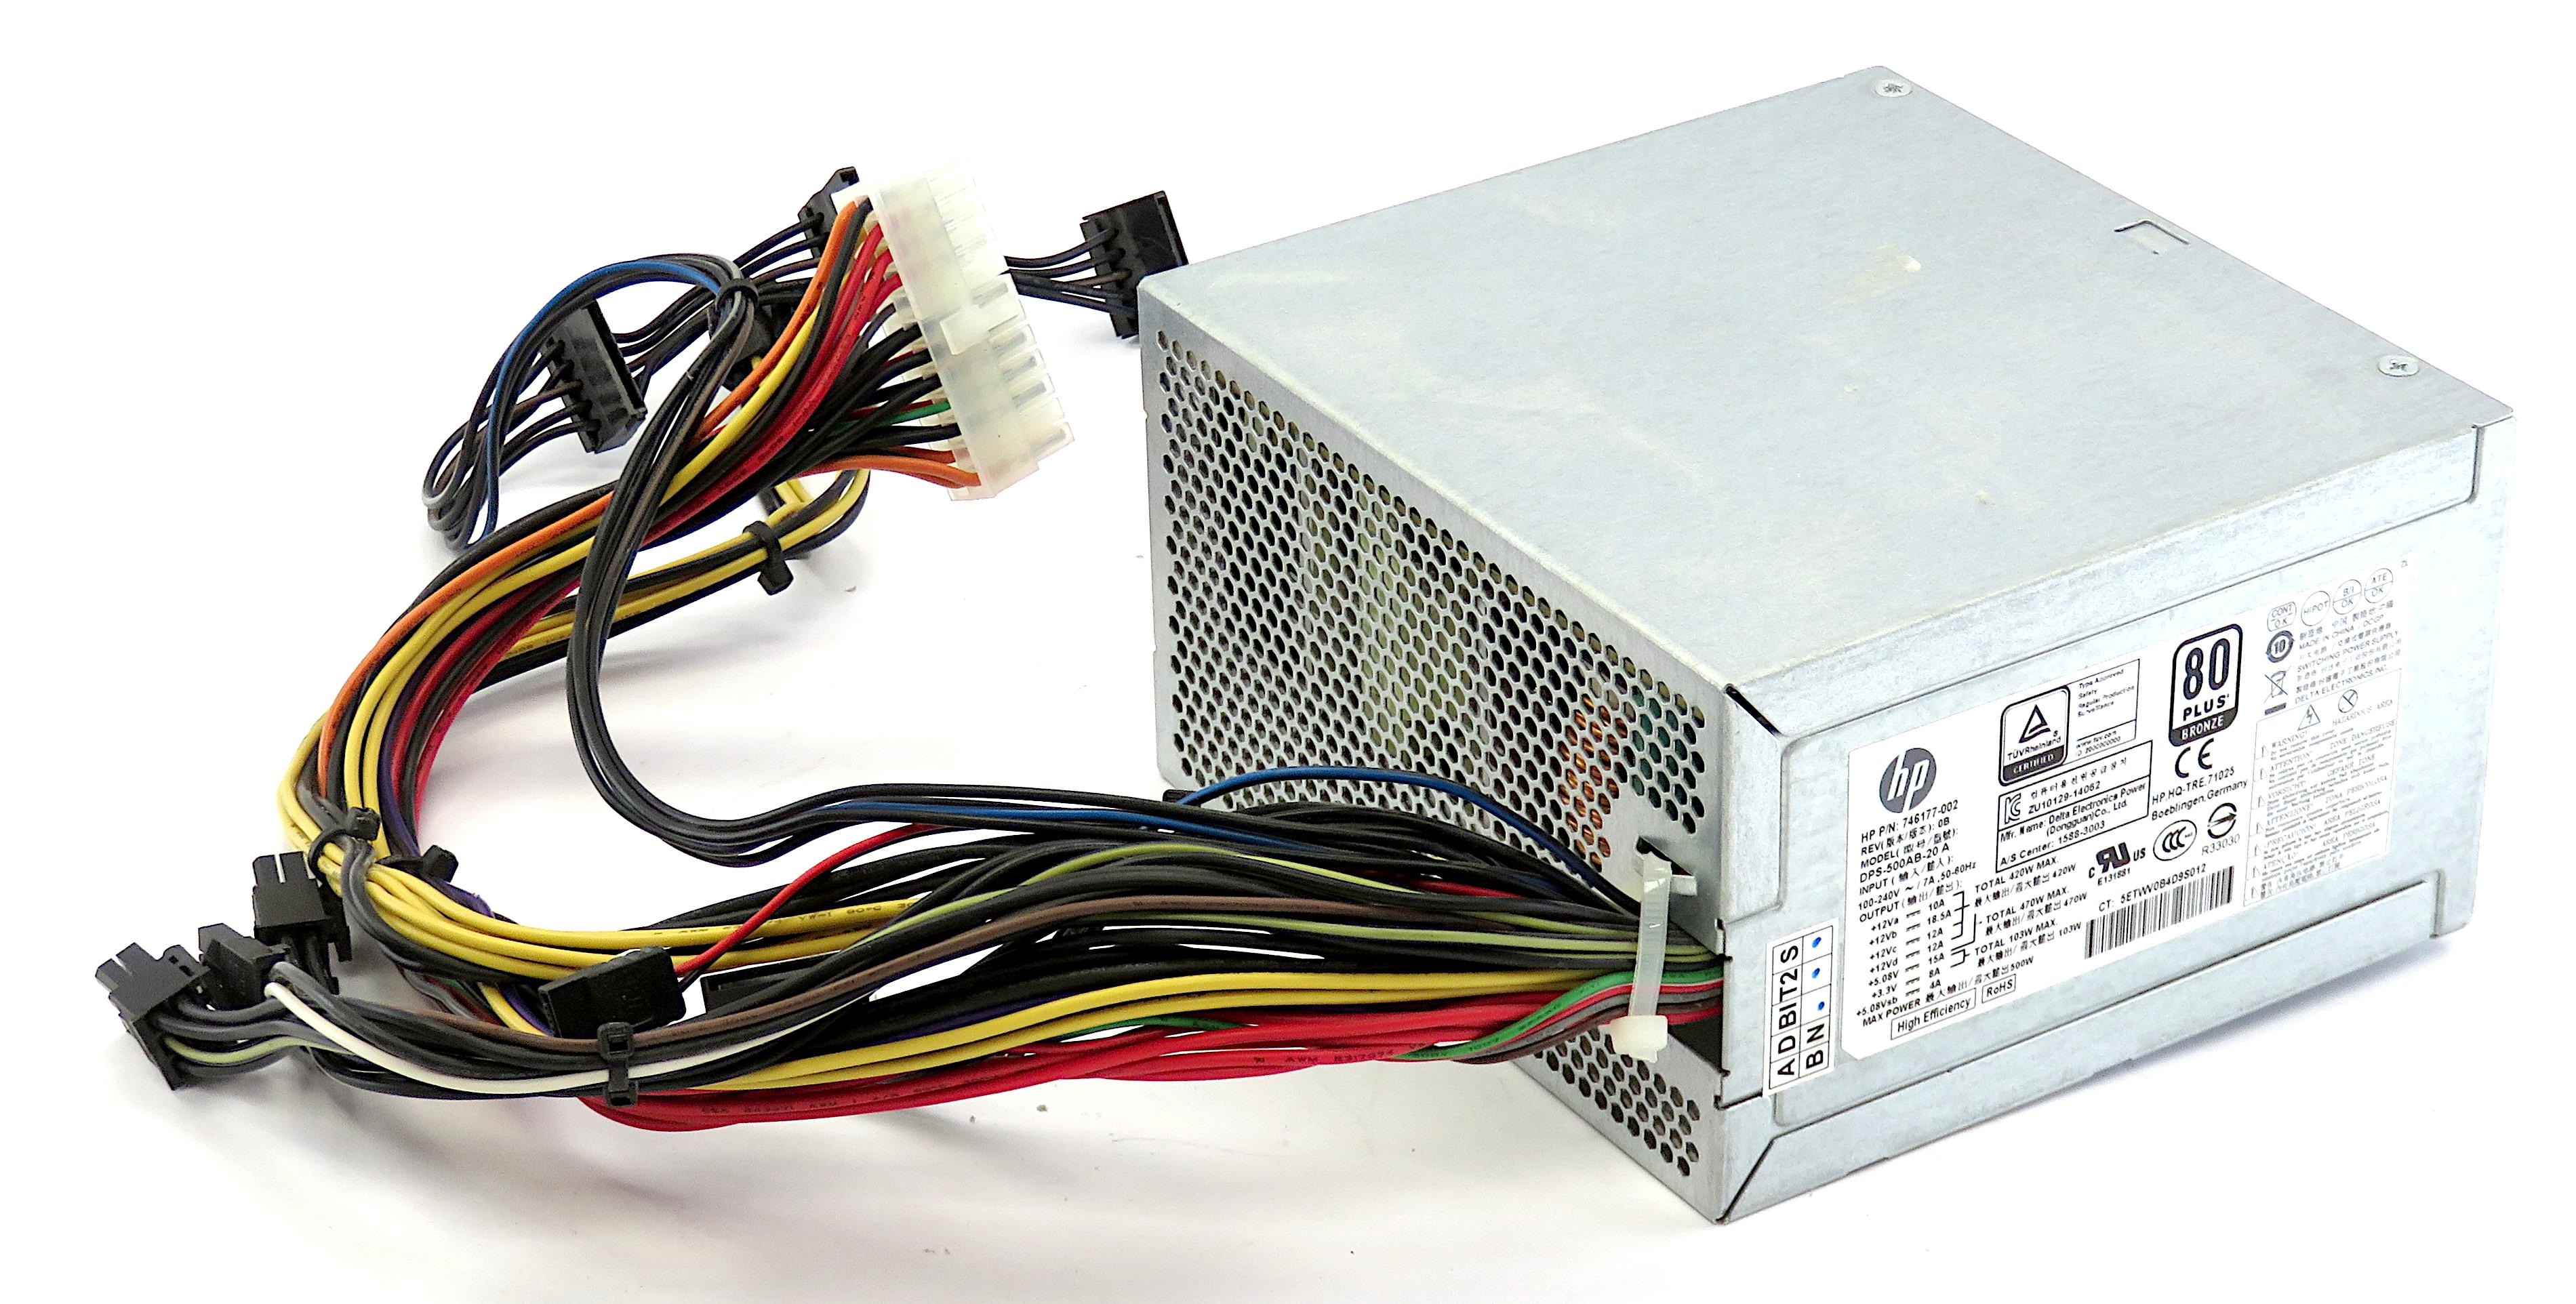 HP 746177-002 500W 80+ Bronze 24-pin ATX PSU DPS-500AB-20